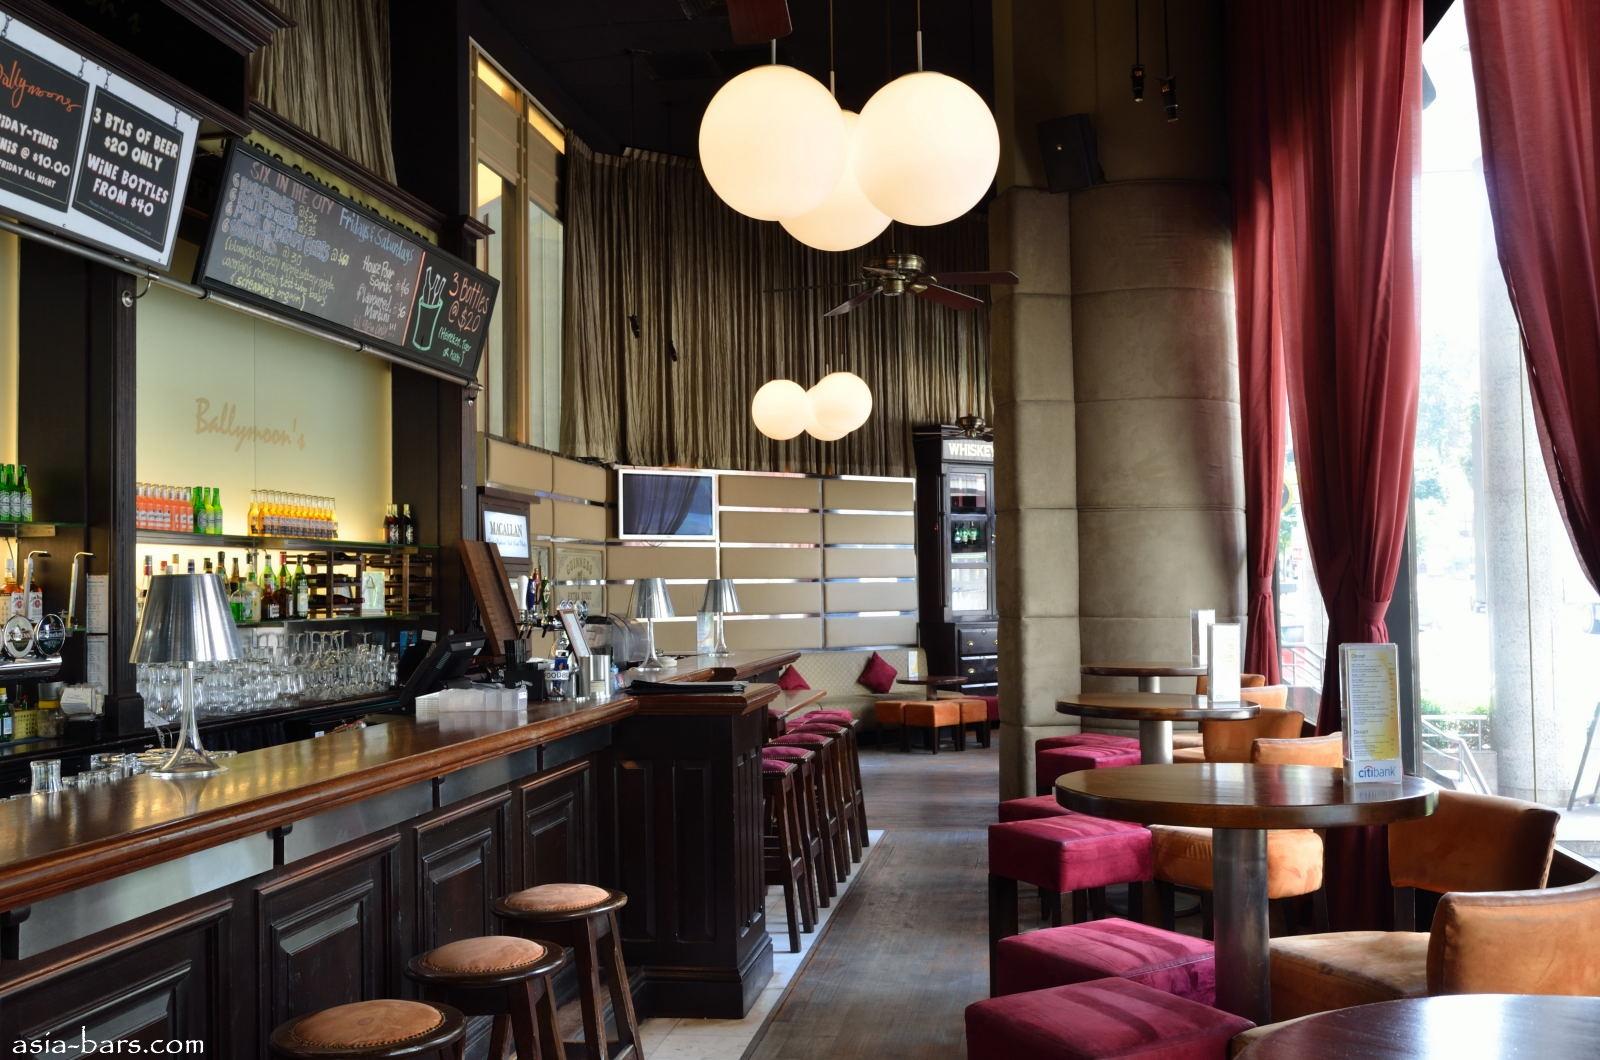 Ballymoon S Spirits Bar Contemporary Irish Bar And Lounge